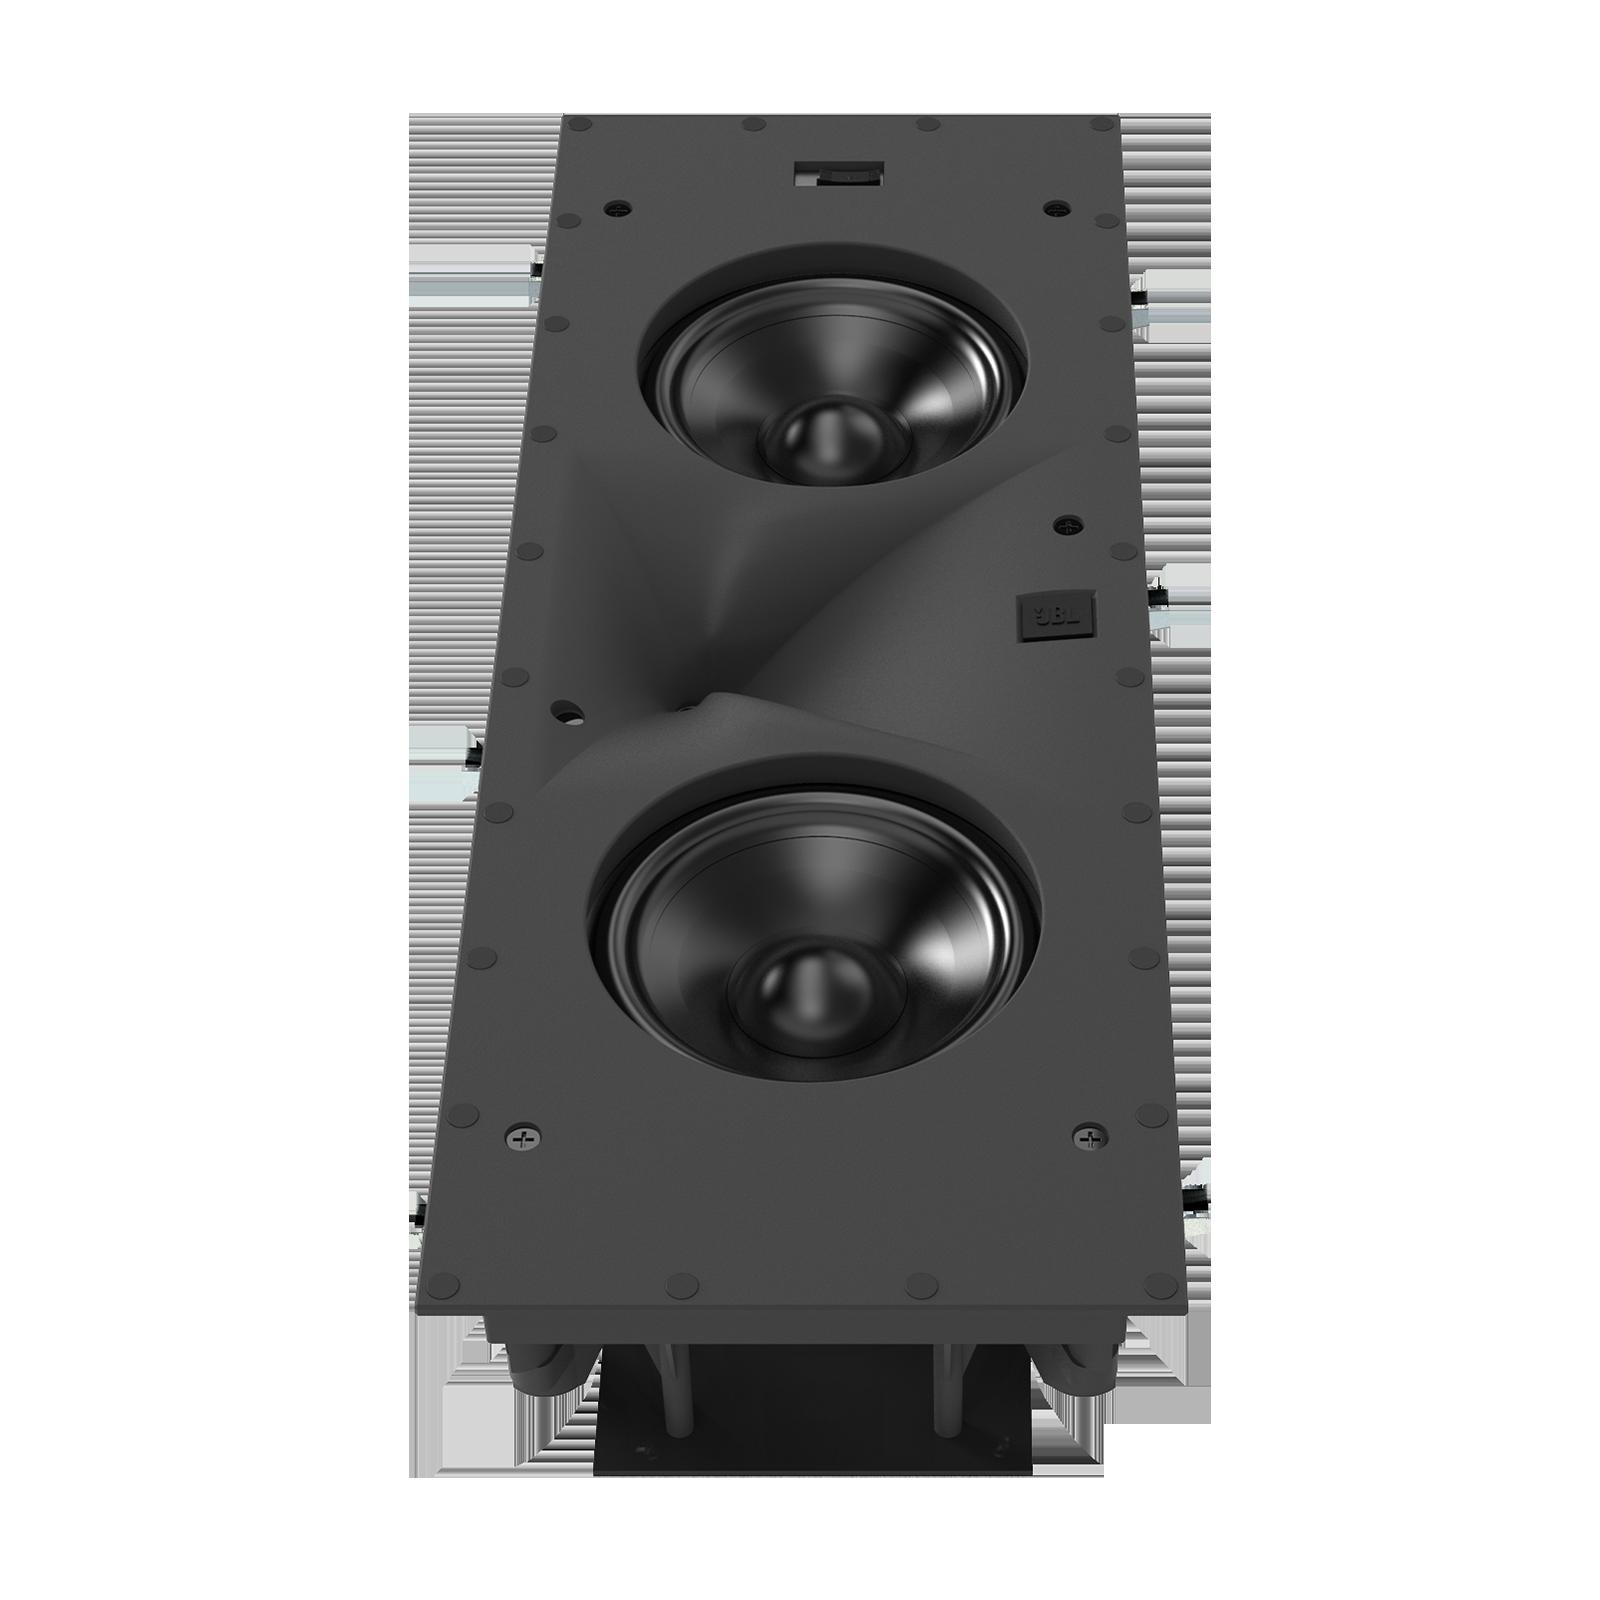 SCL-7 - Black - 2-Way Dual 5.25-inch (130mm) In-Wall Loudspeaker - Detailshot 1